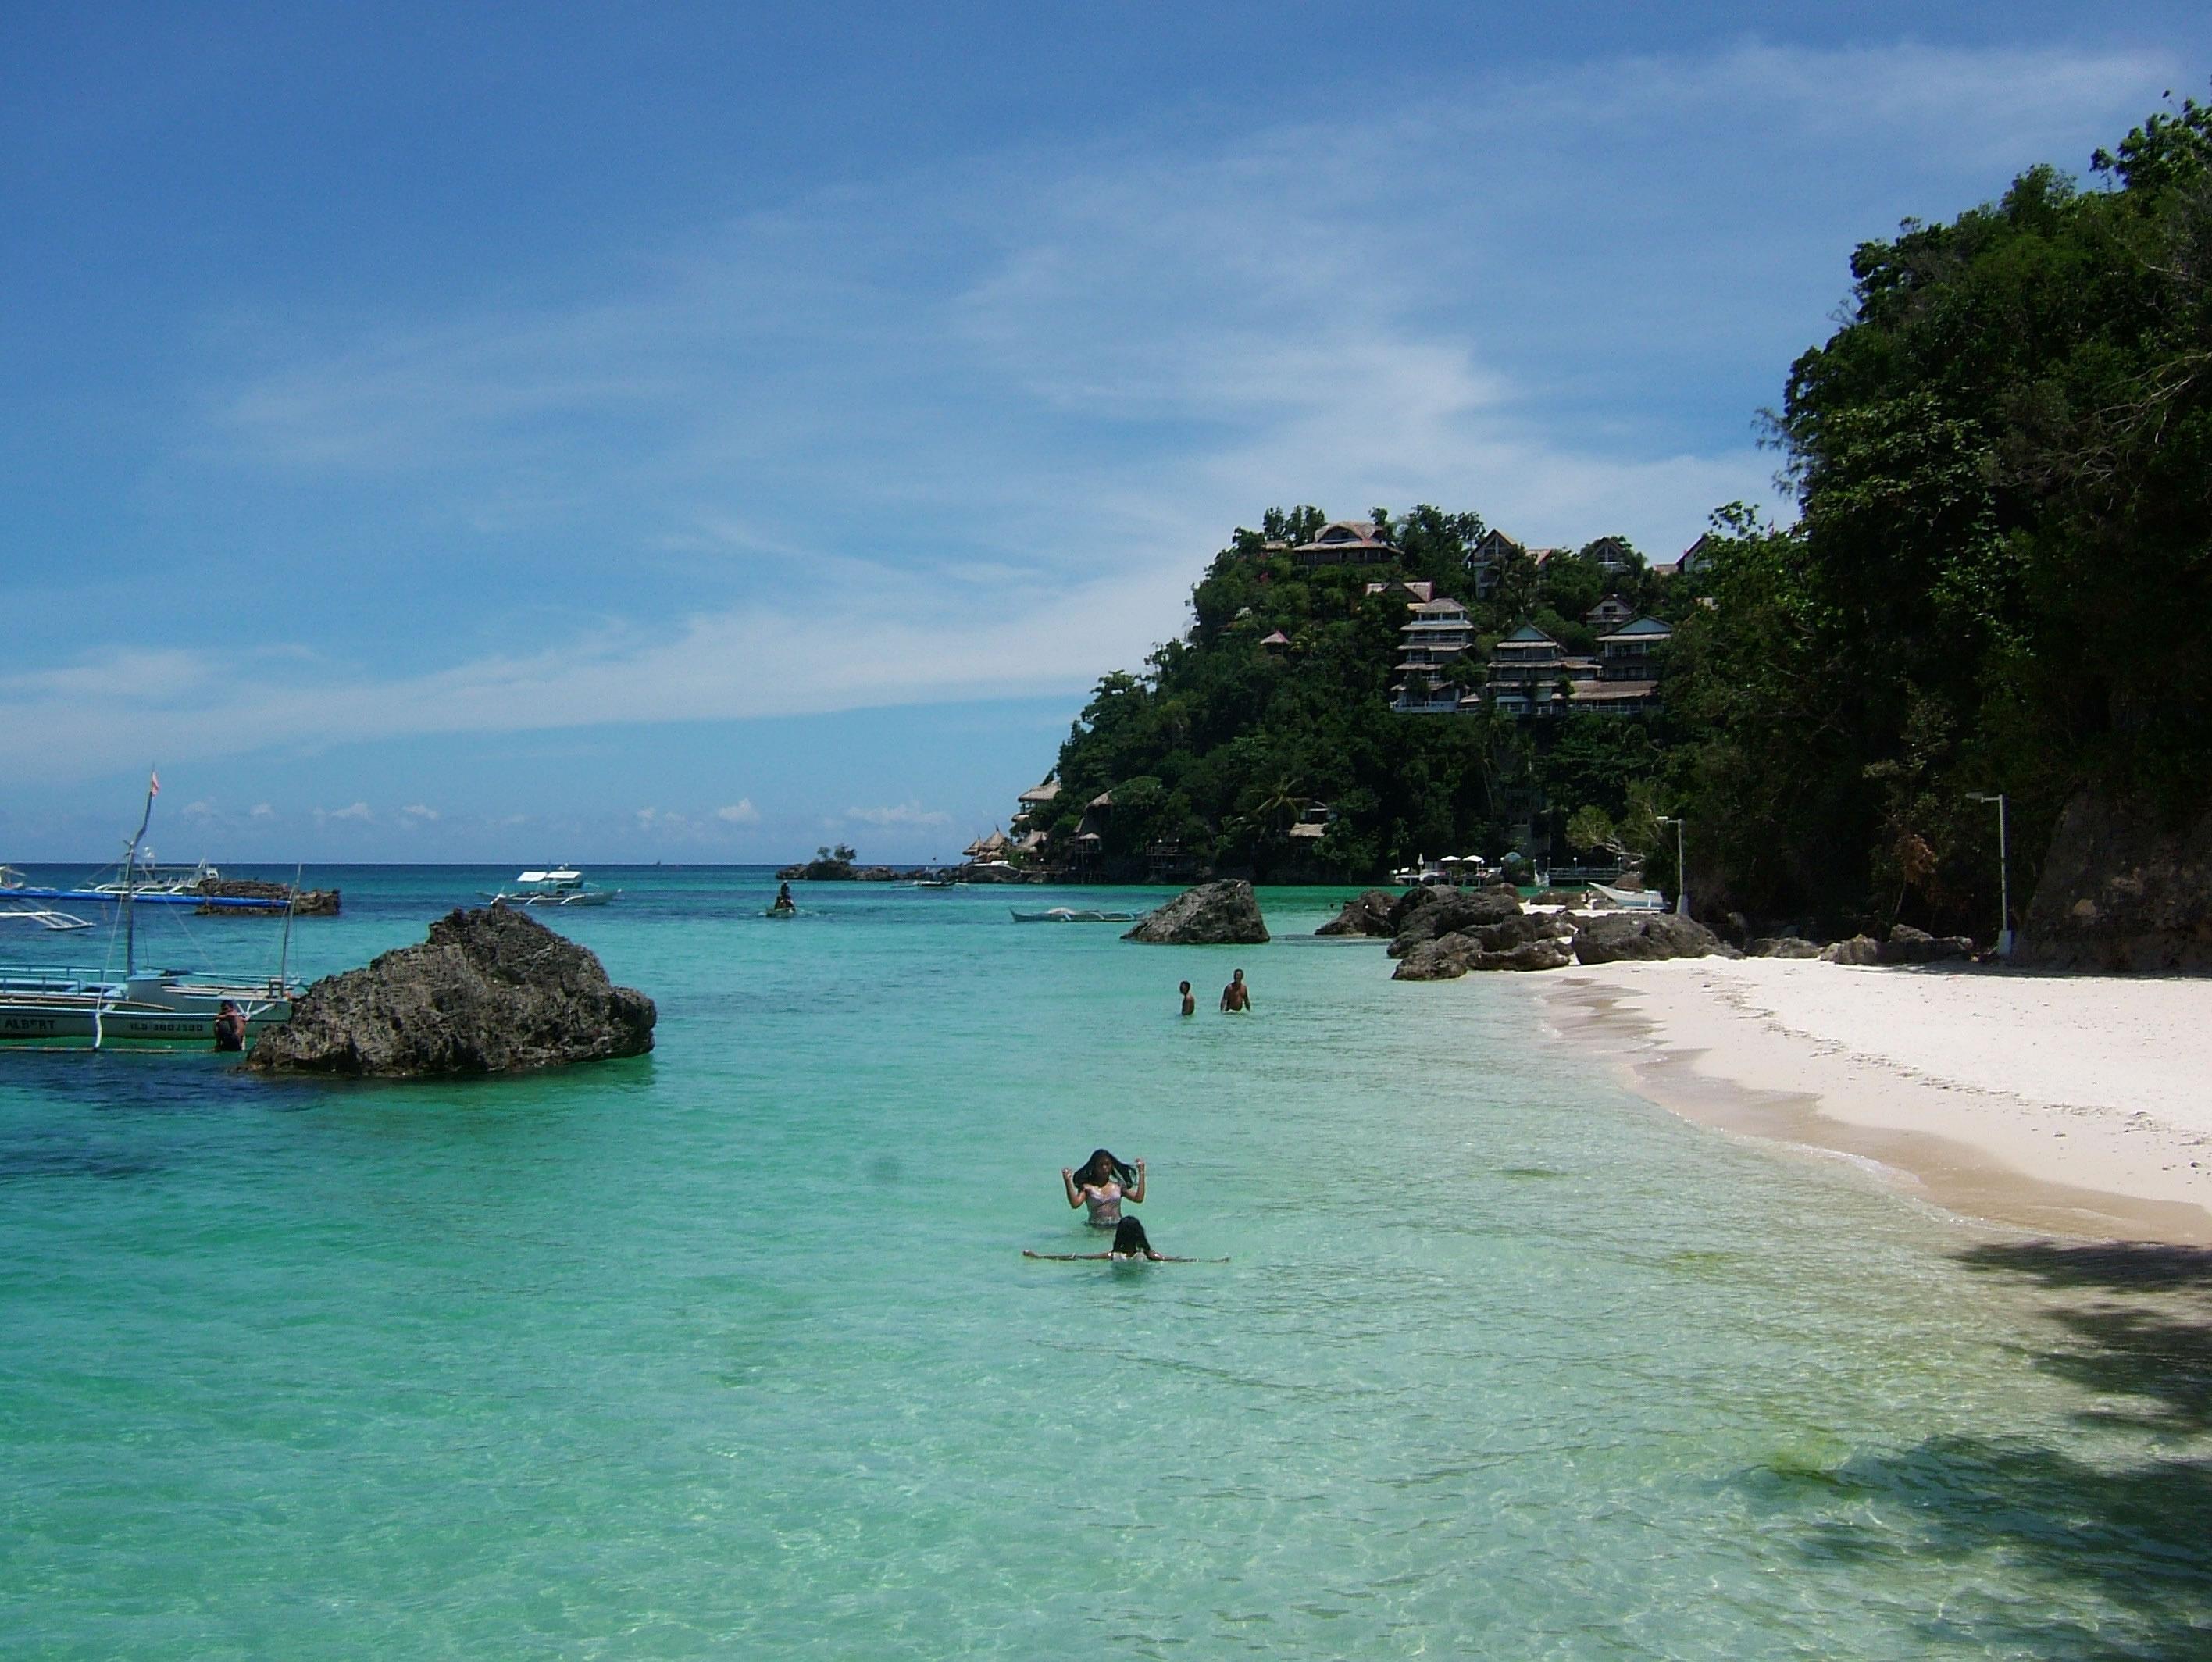 Philippines Sugar Islands Boracay Punta bunga beach Resorts 2007 03